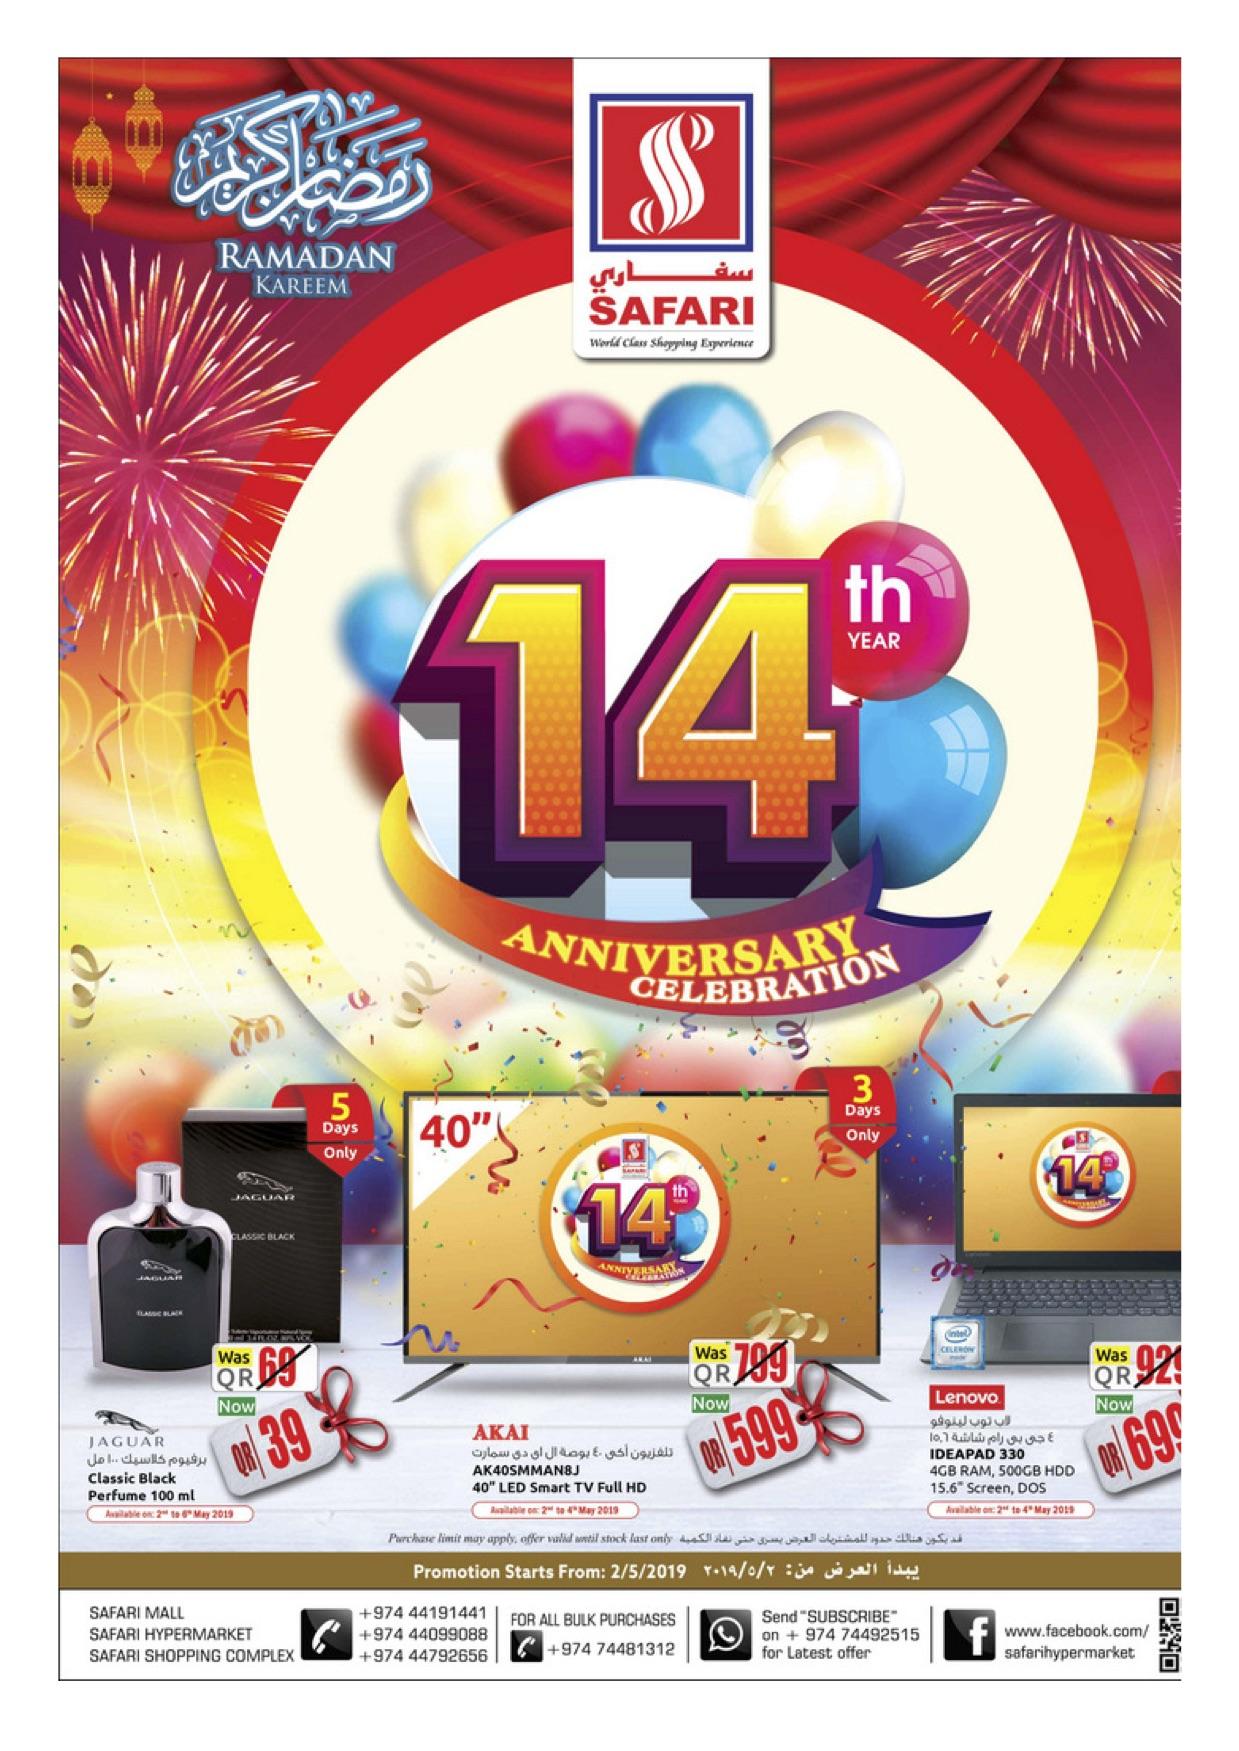 Safari Hypermarket Promotions in Qatar and Doha - DiscountsQatar Com